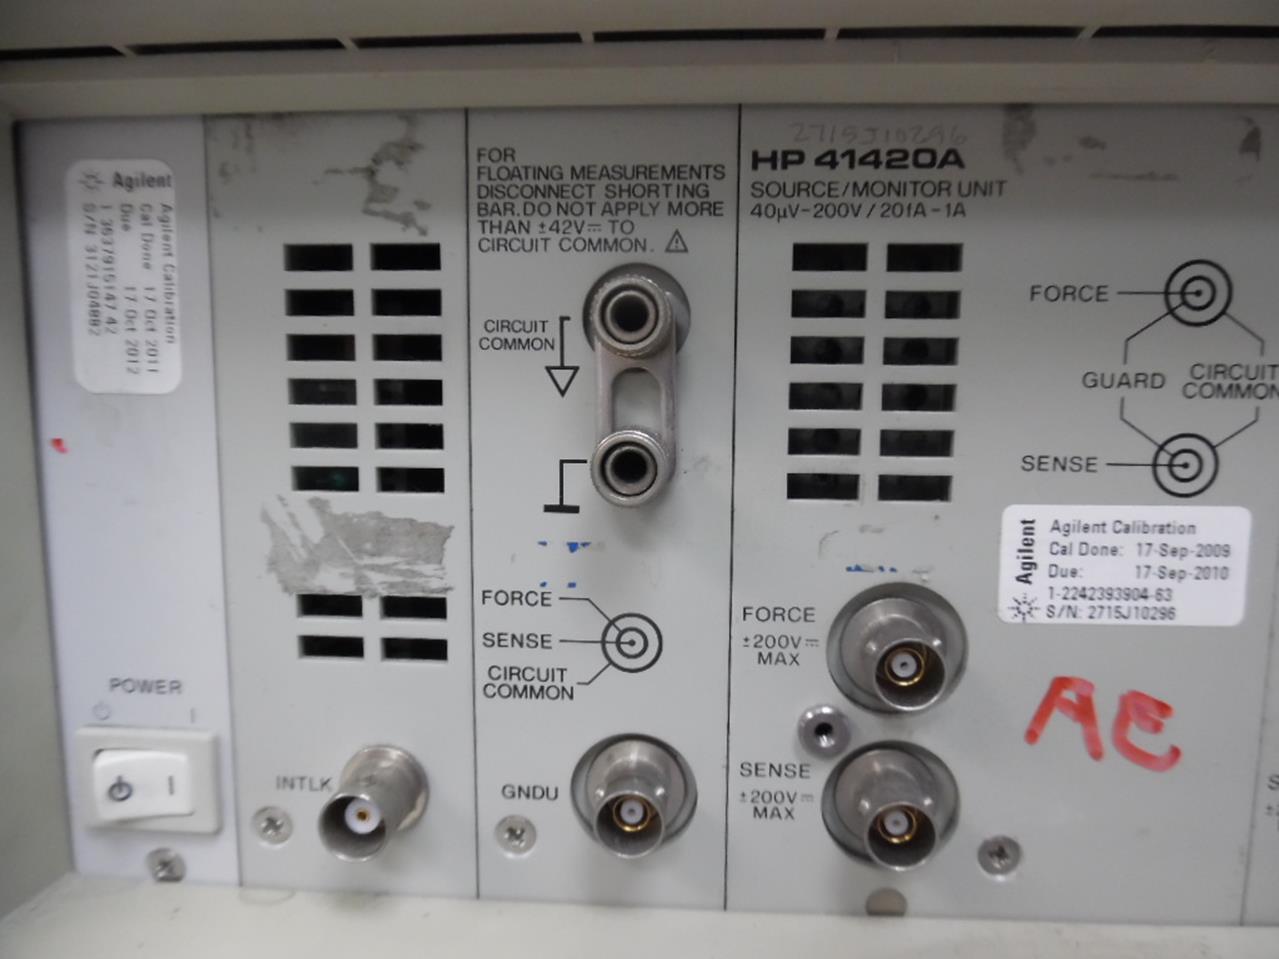 hp 4142b manual car owners manual u2022 rh karenhanover co hp4142b service manual 18 HP Vanguard Manual